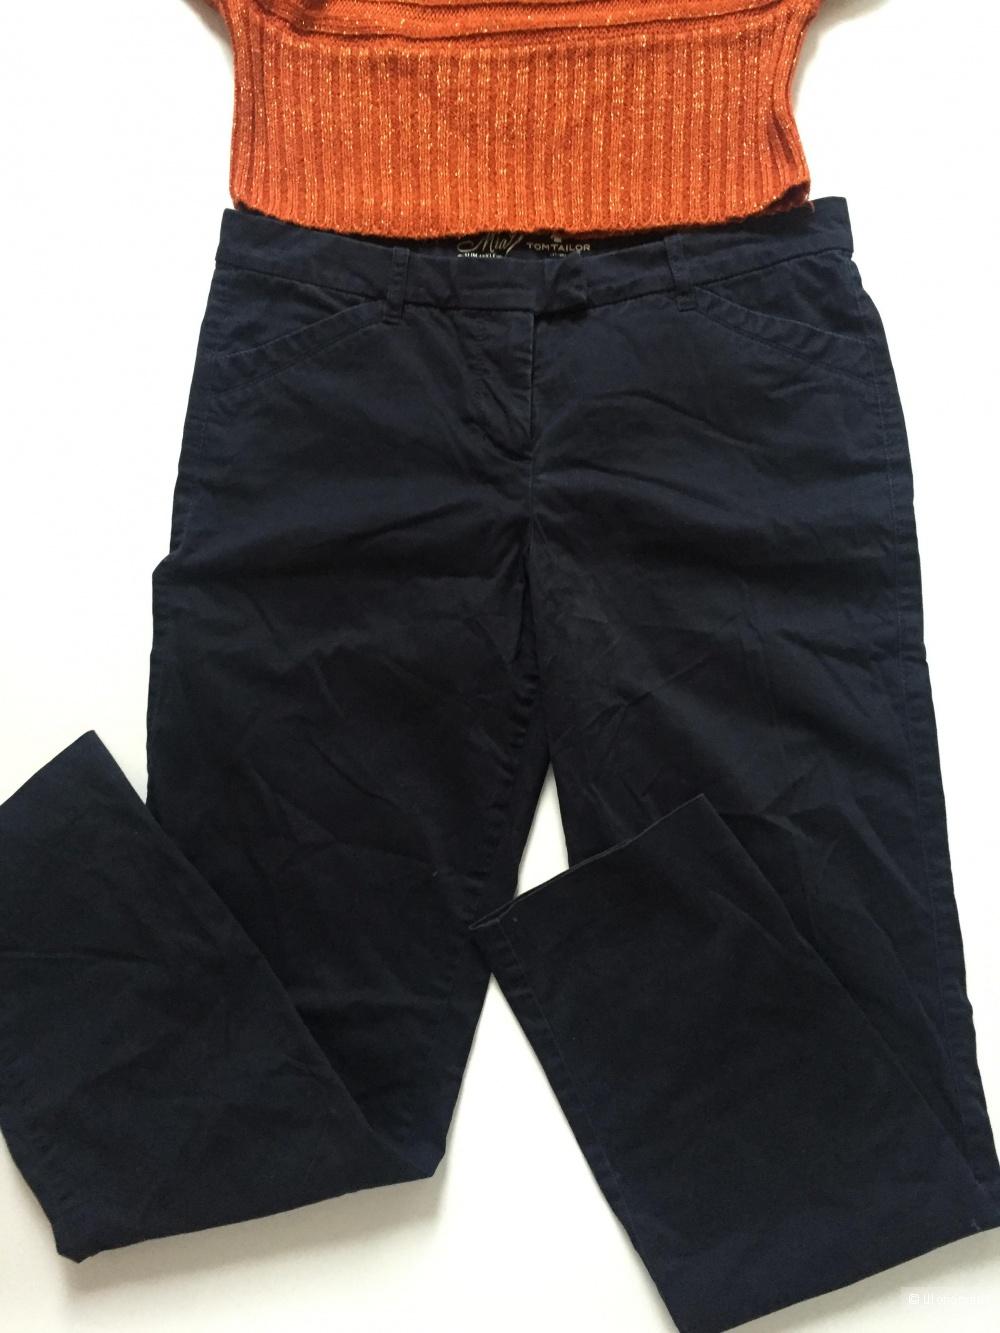 Комплект кофта оверсайз и брюки размер 38